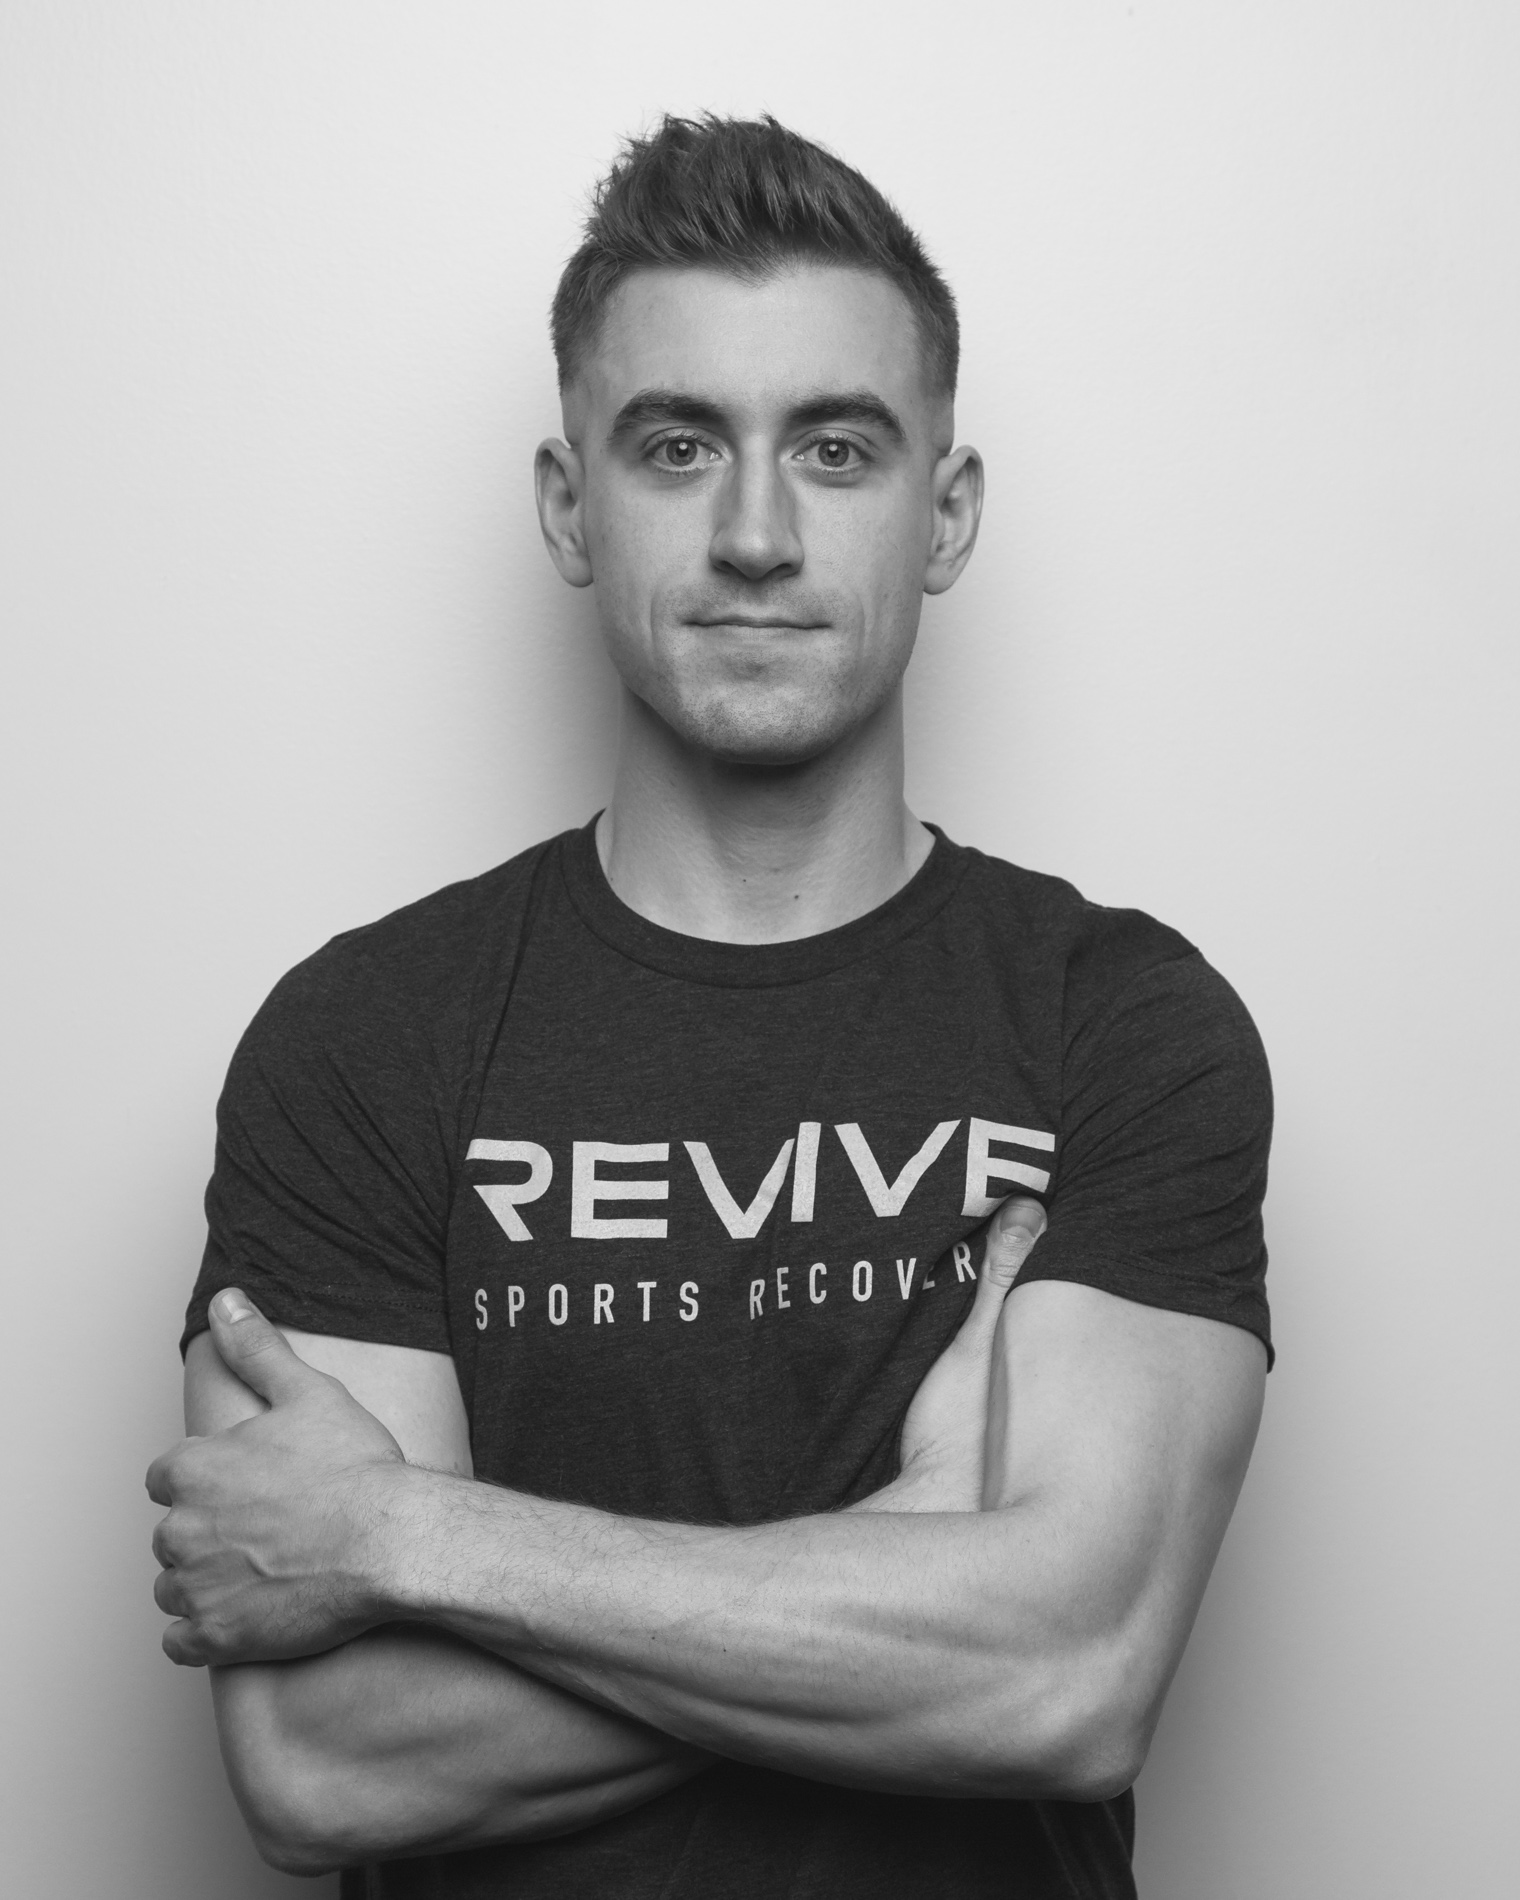 Blake Mundell - Co-Owner + FounderStretch & Massage Therapist